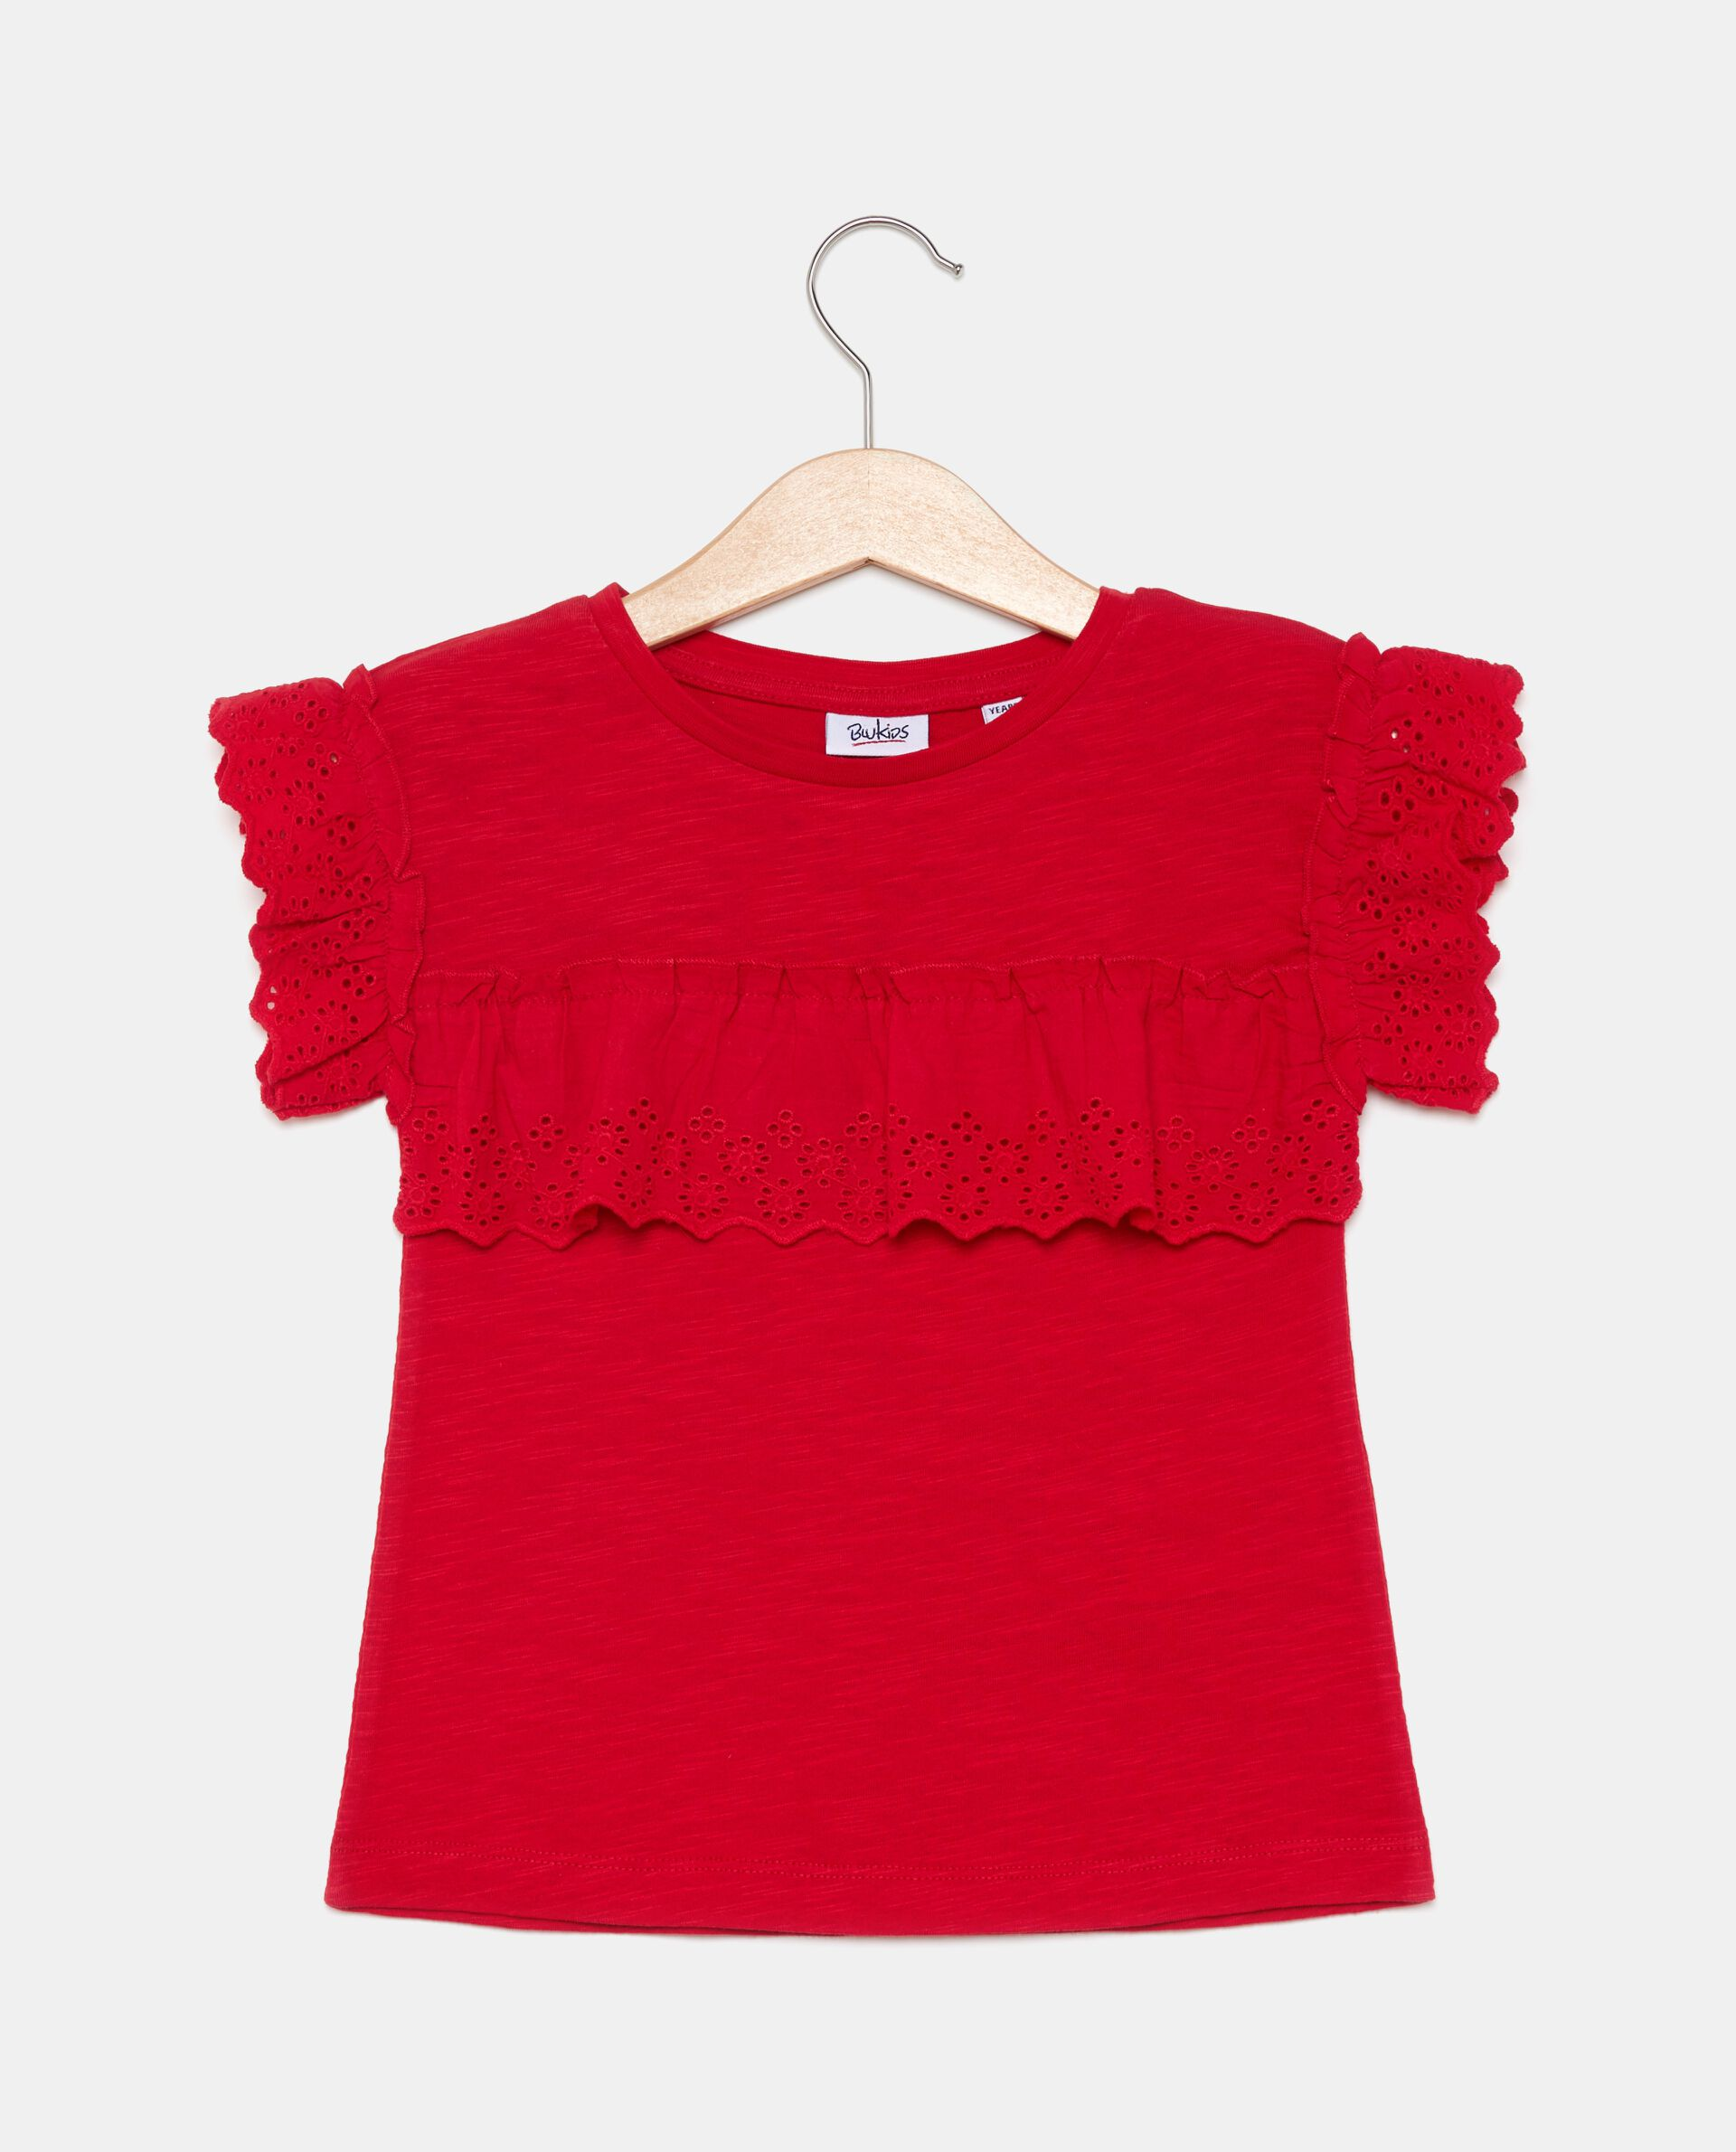 T-shirt in puro cotone bambina